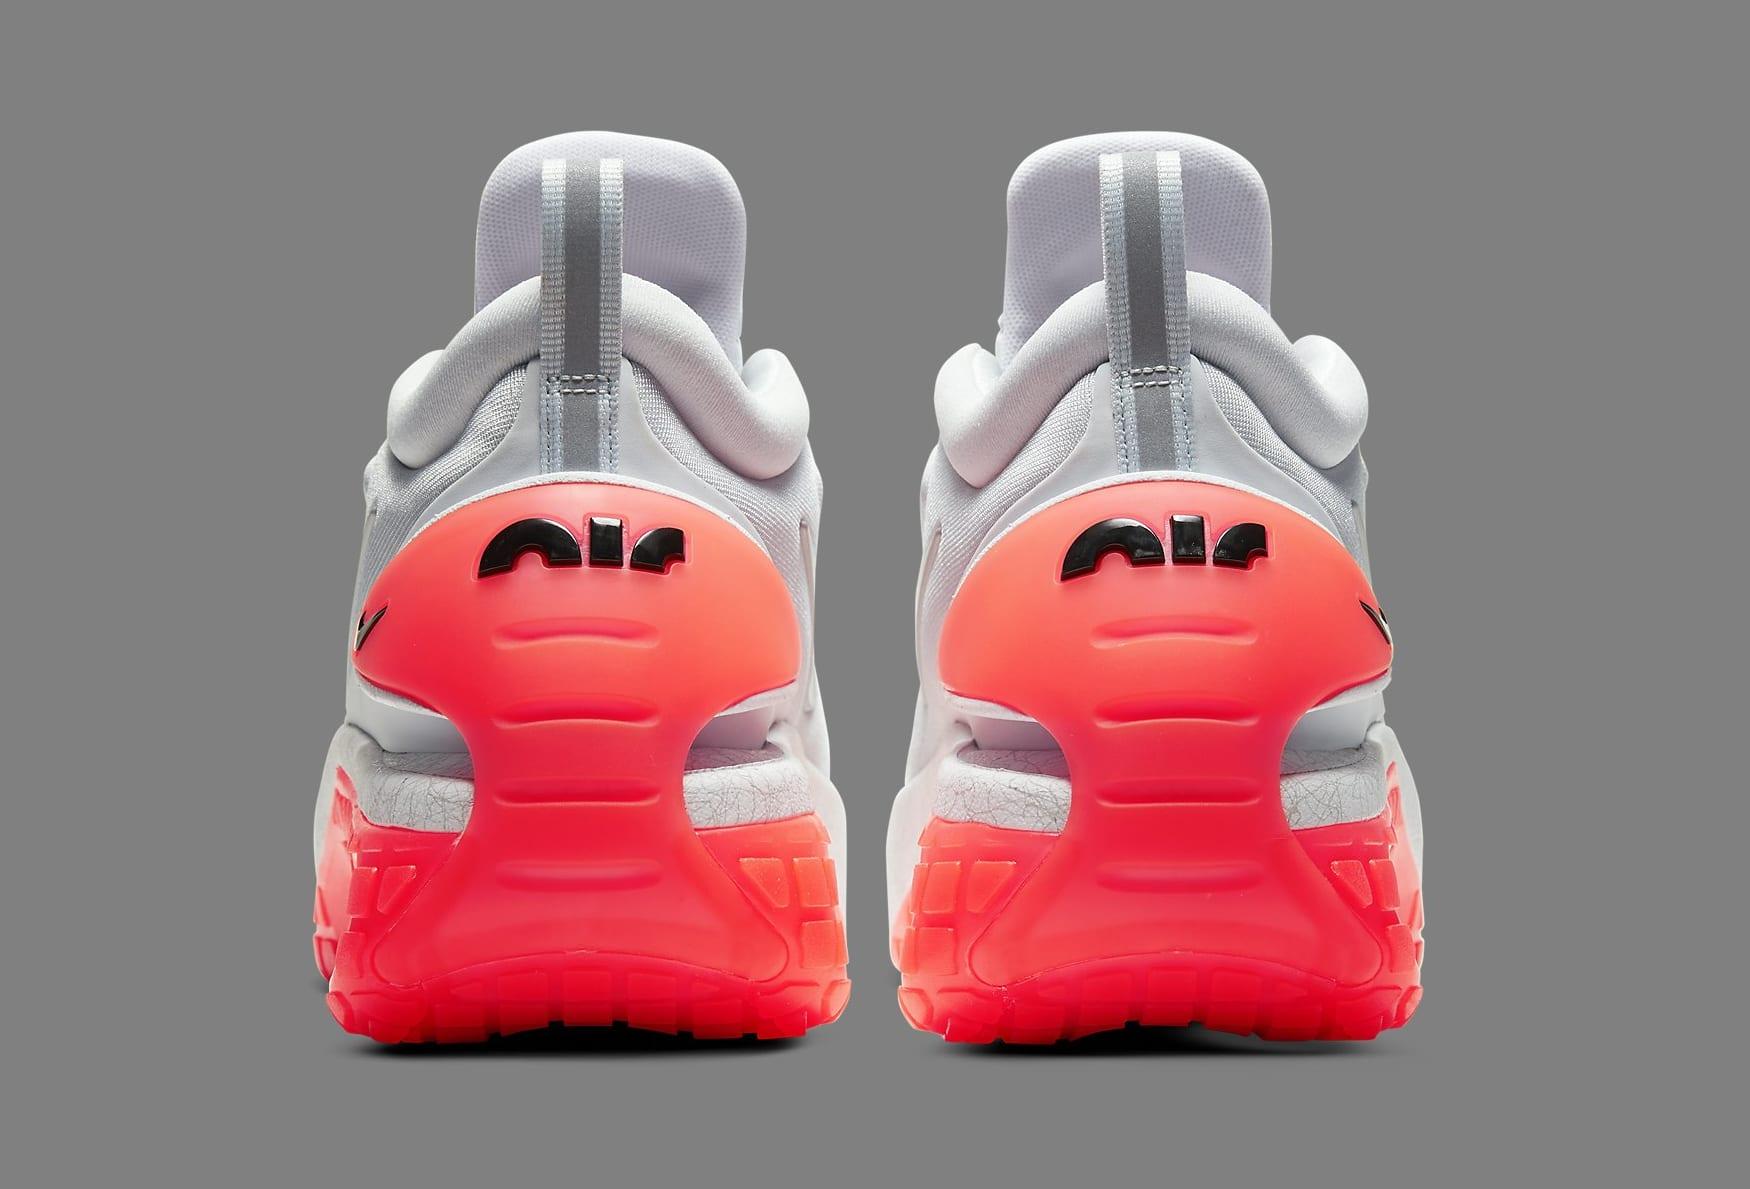 Nike Adapt Auto Max 'Infrared' CI5018-002 Heel